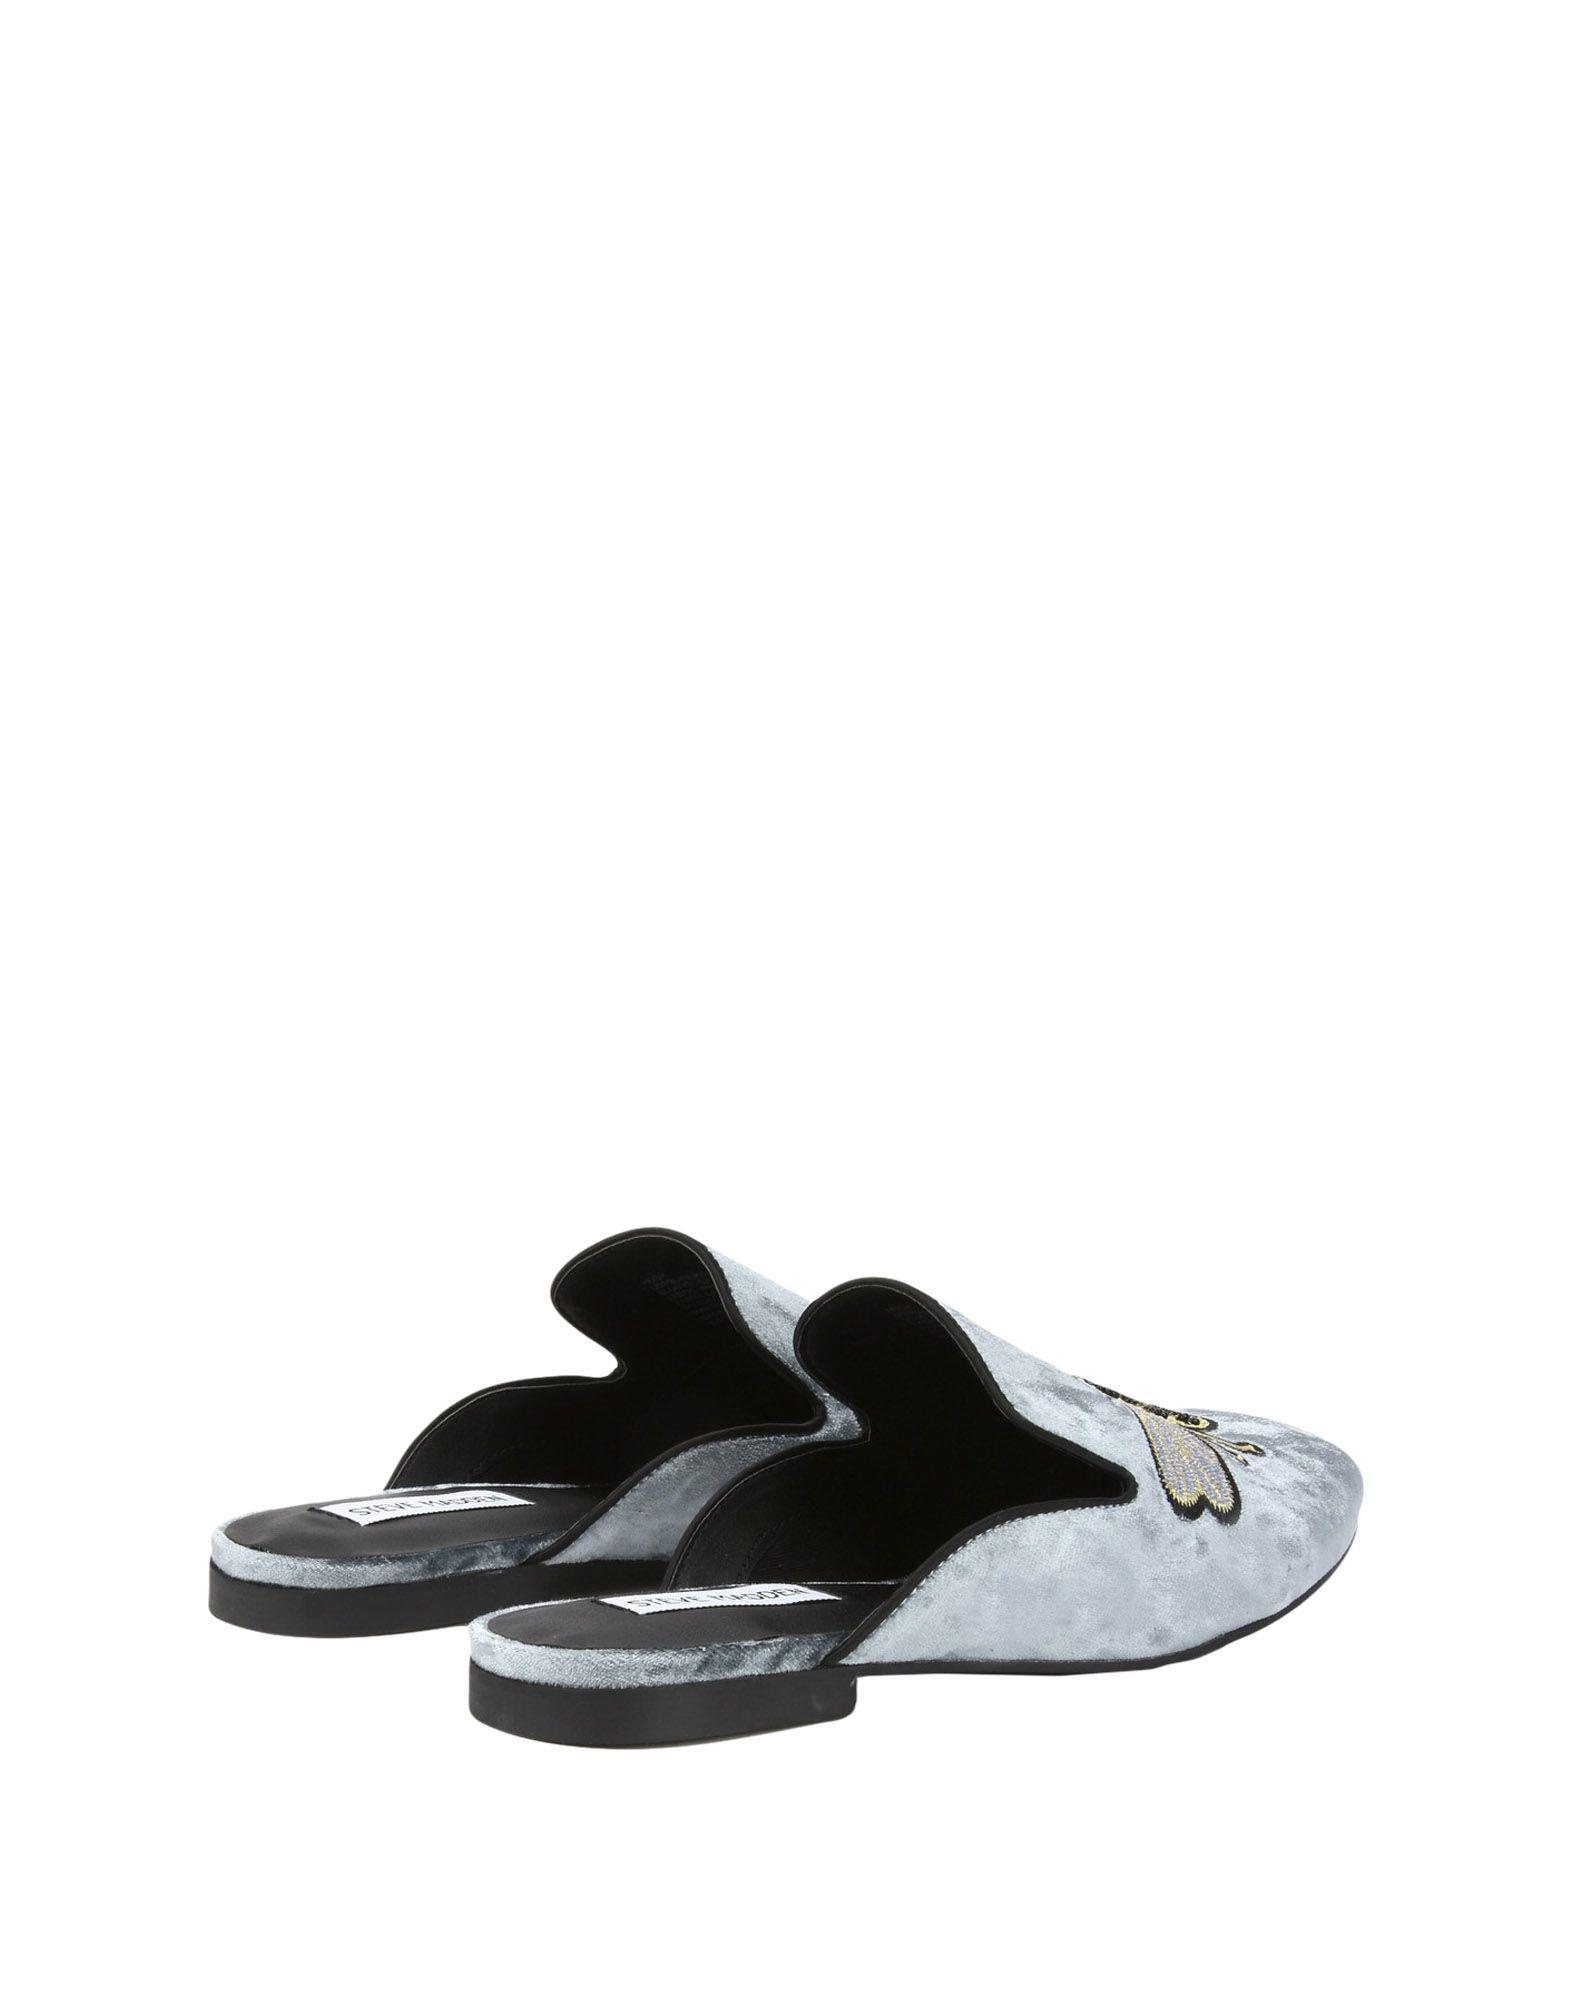 Steve Madden Hugh Loafer beliebte  11457428AP Gute Qualität beliebte Loafer Schuhe 3be4d0